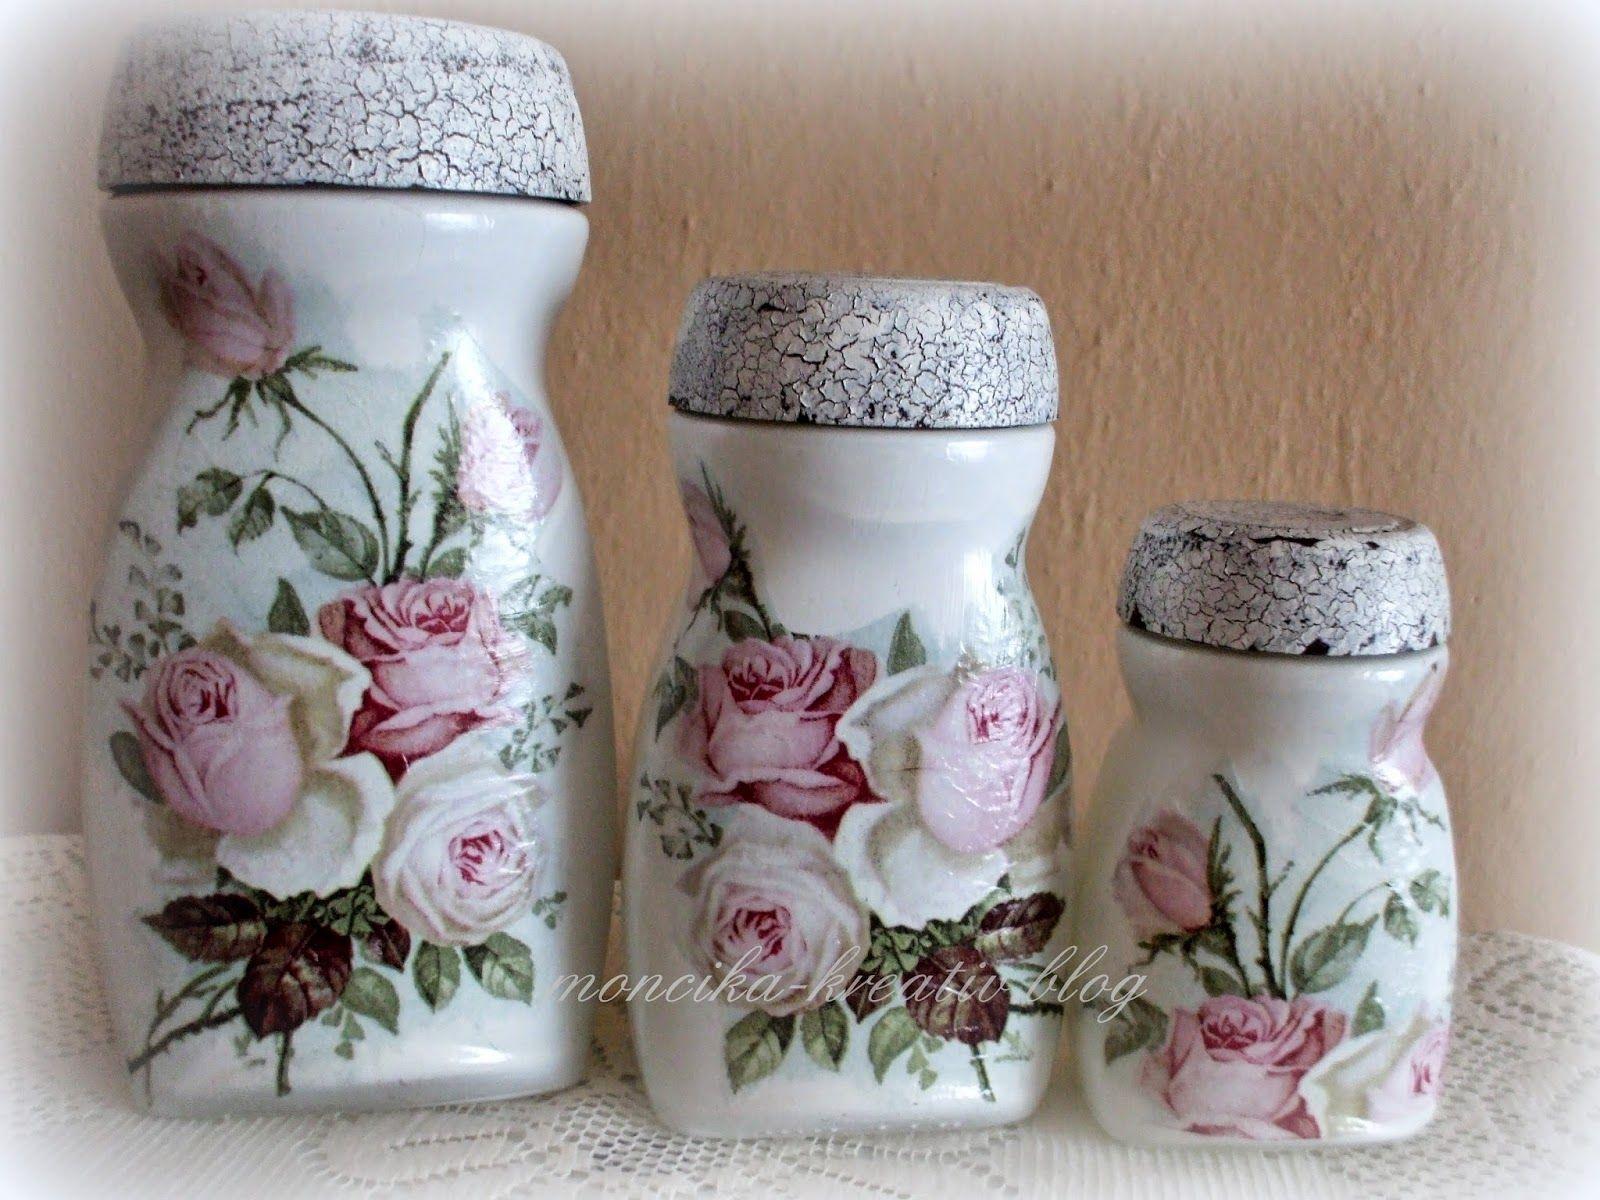 Moncika hobby pinterest - Diy frascos decorados ...